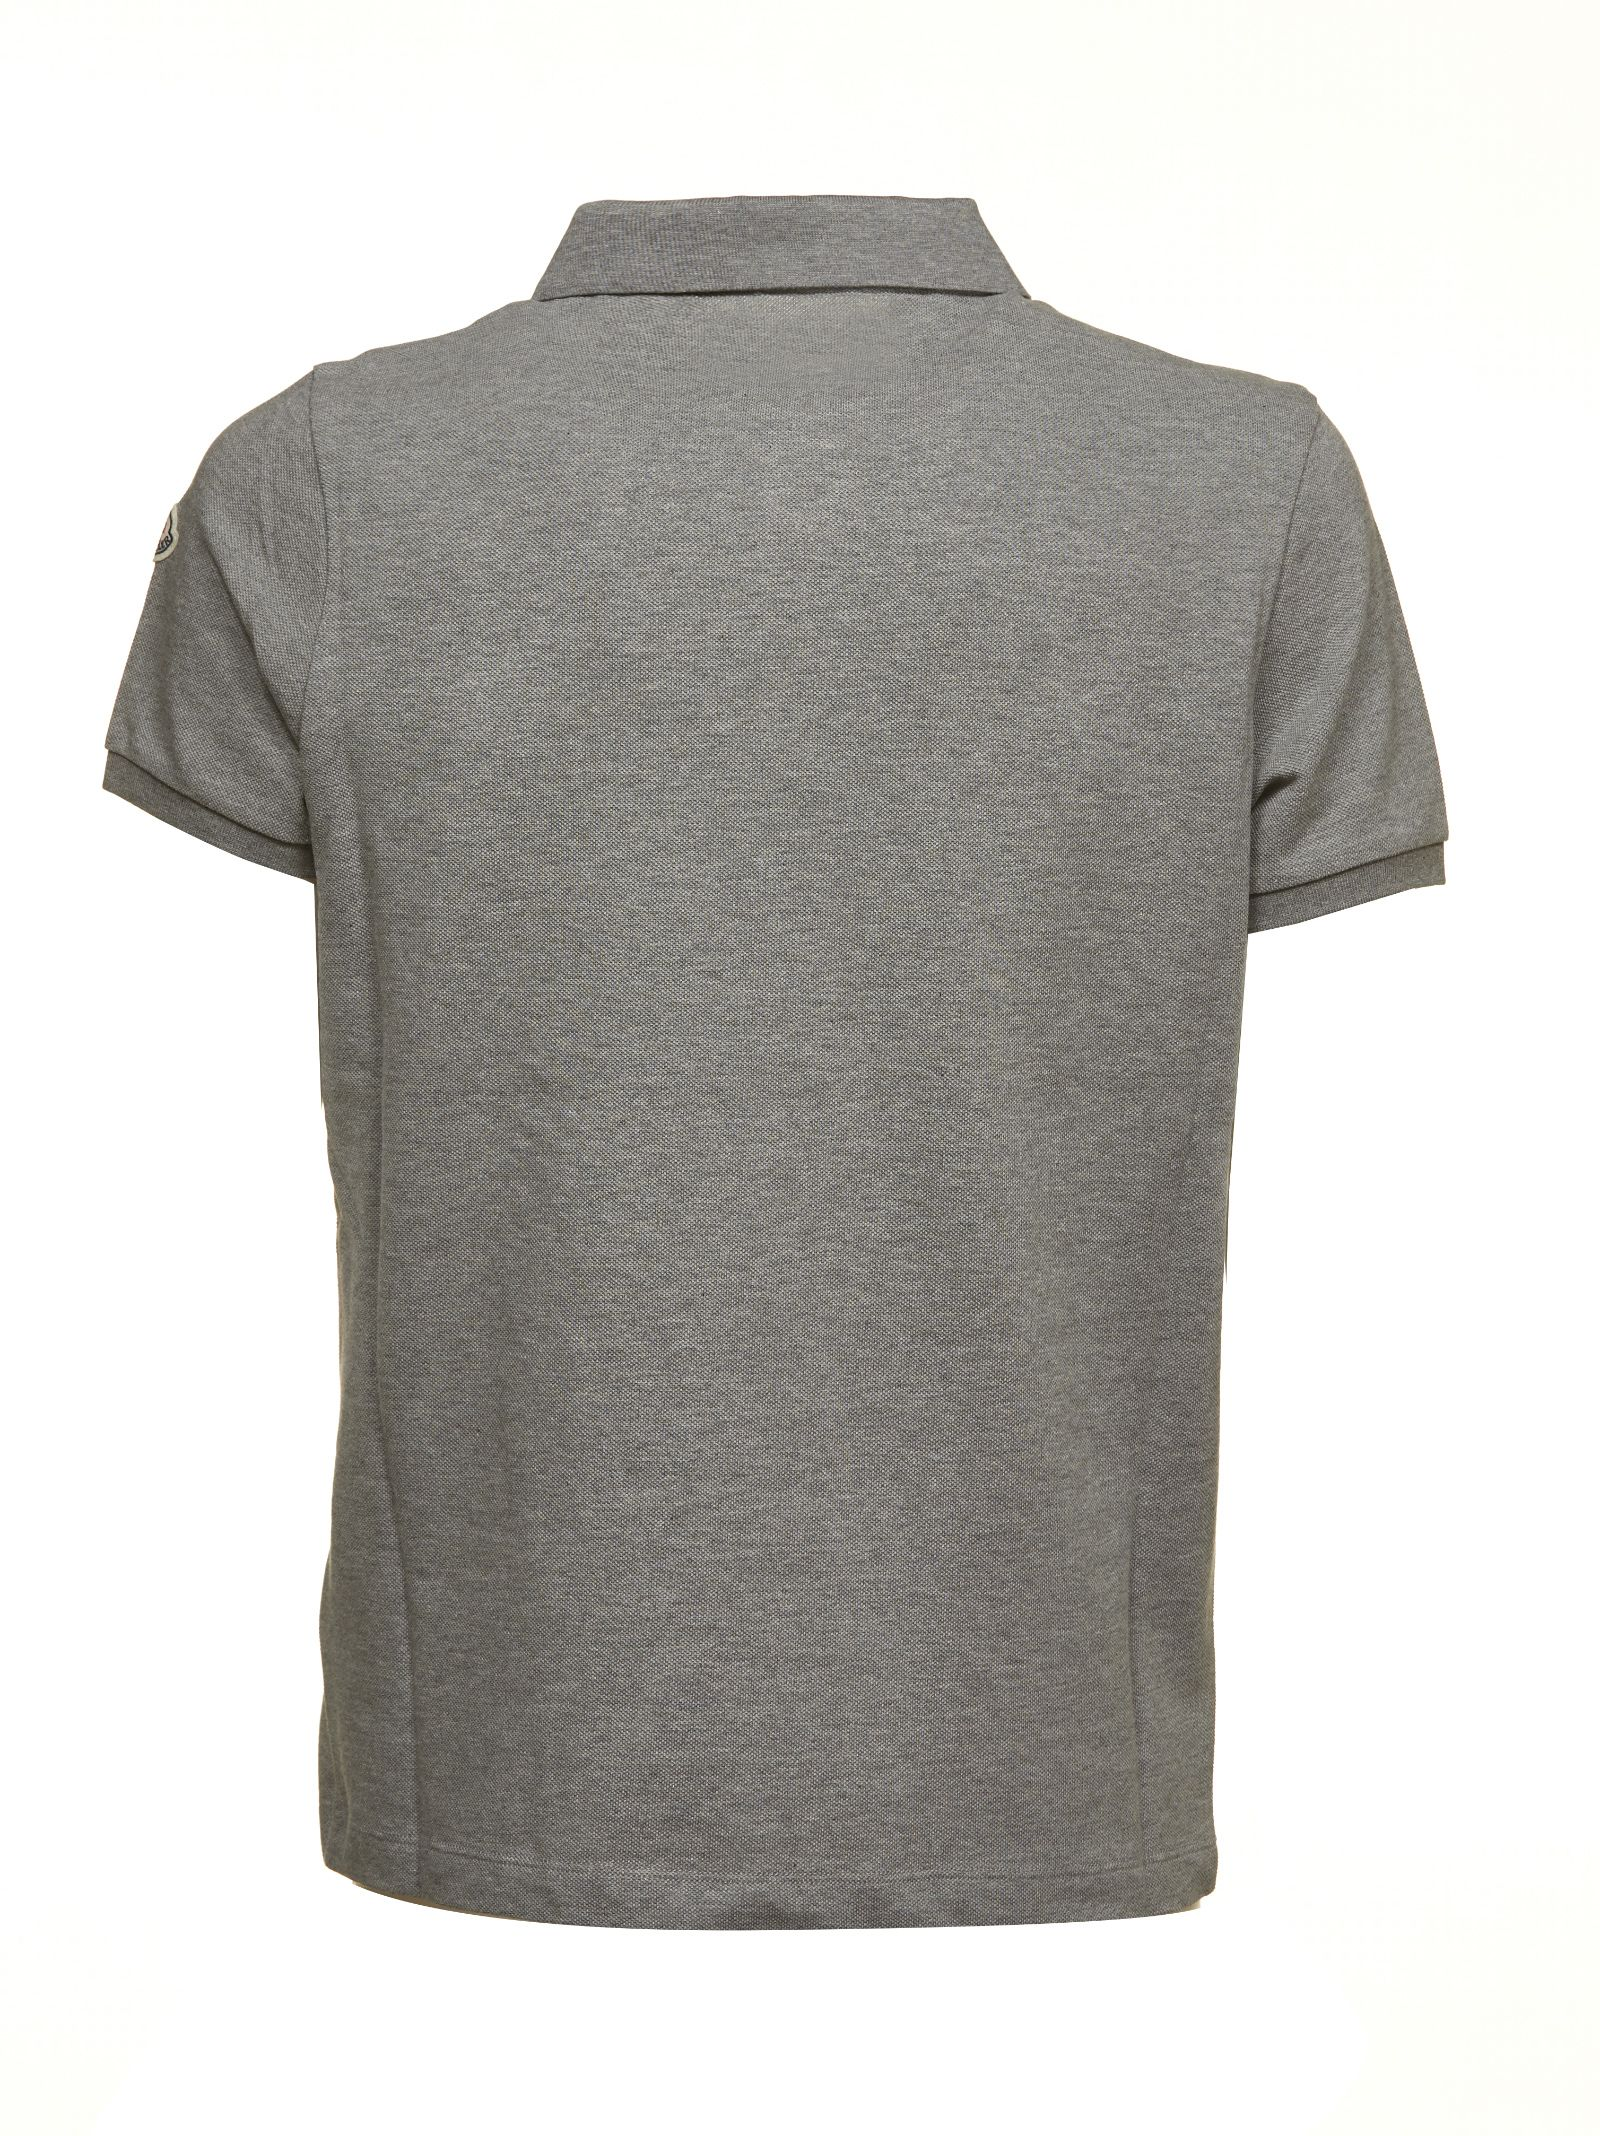 b1dde5649 Mens Designer Polo Shirts Moncler